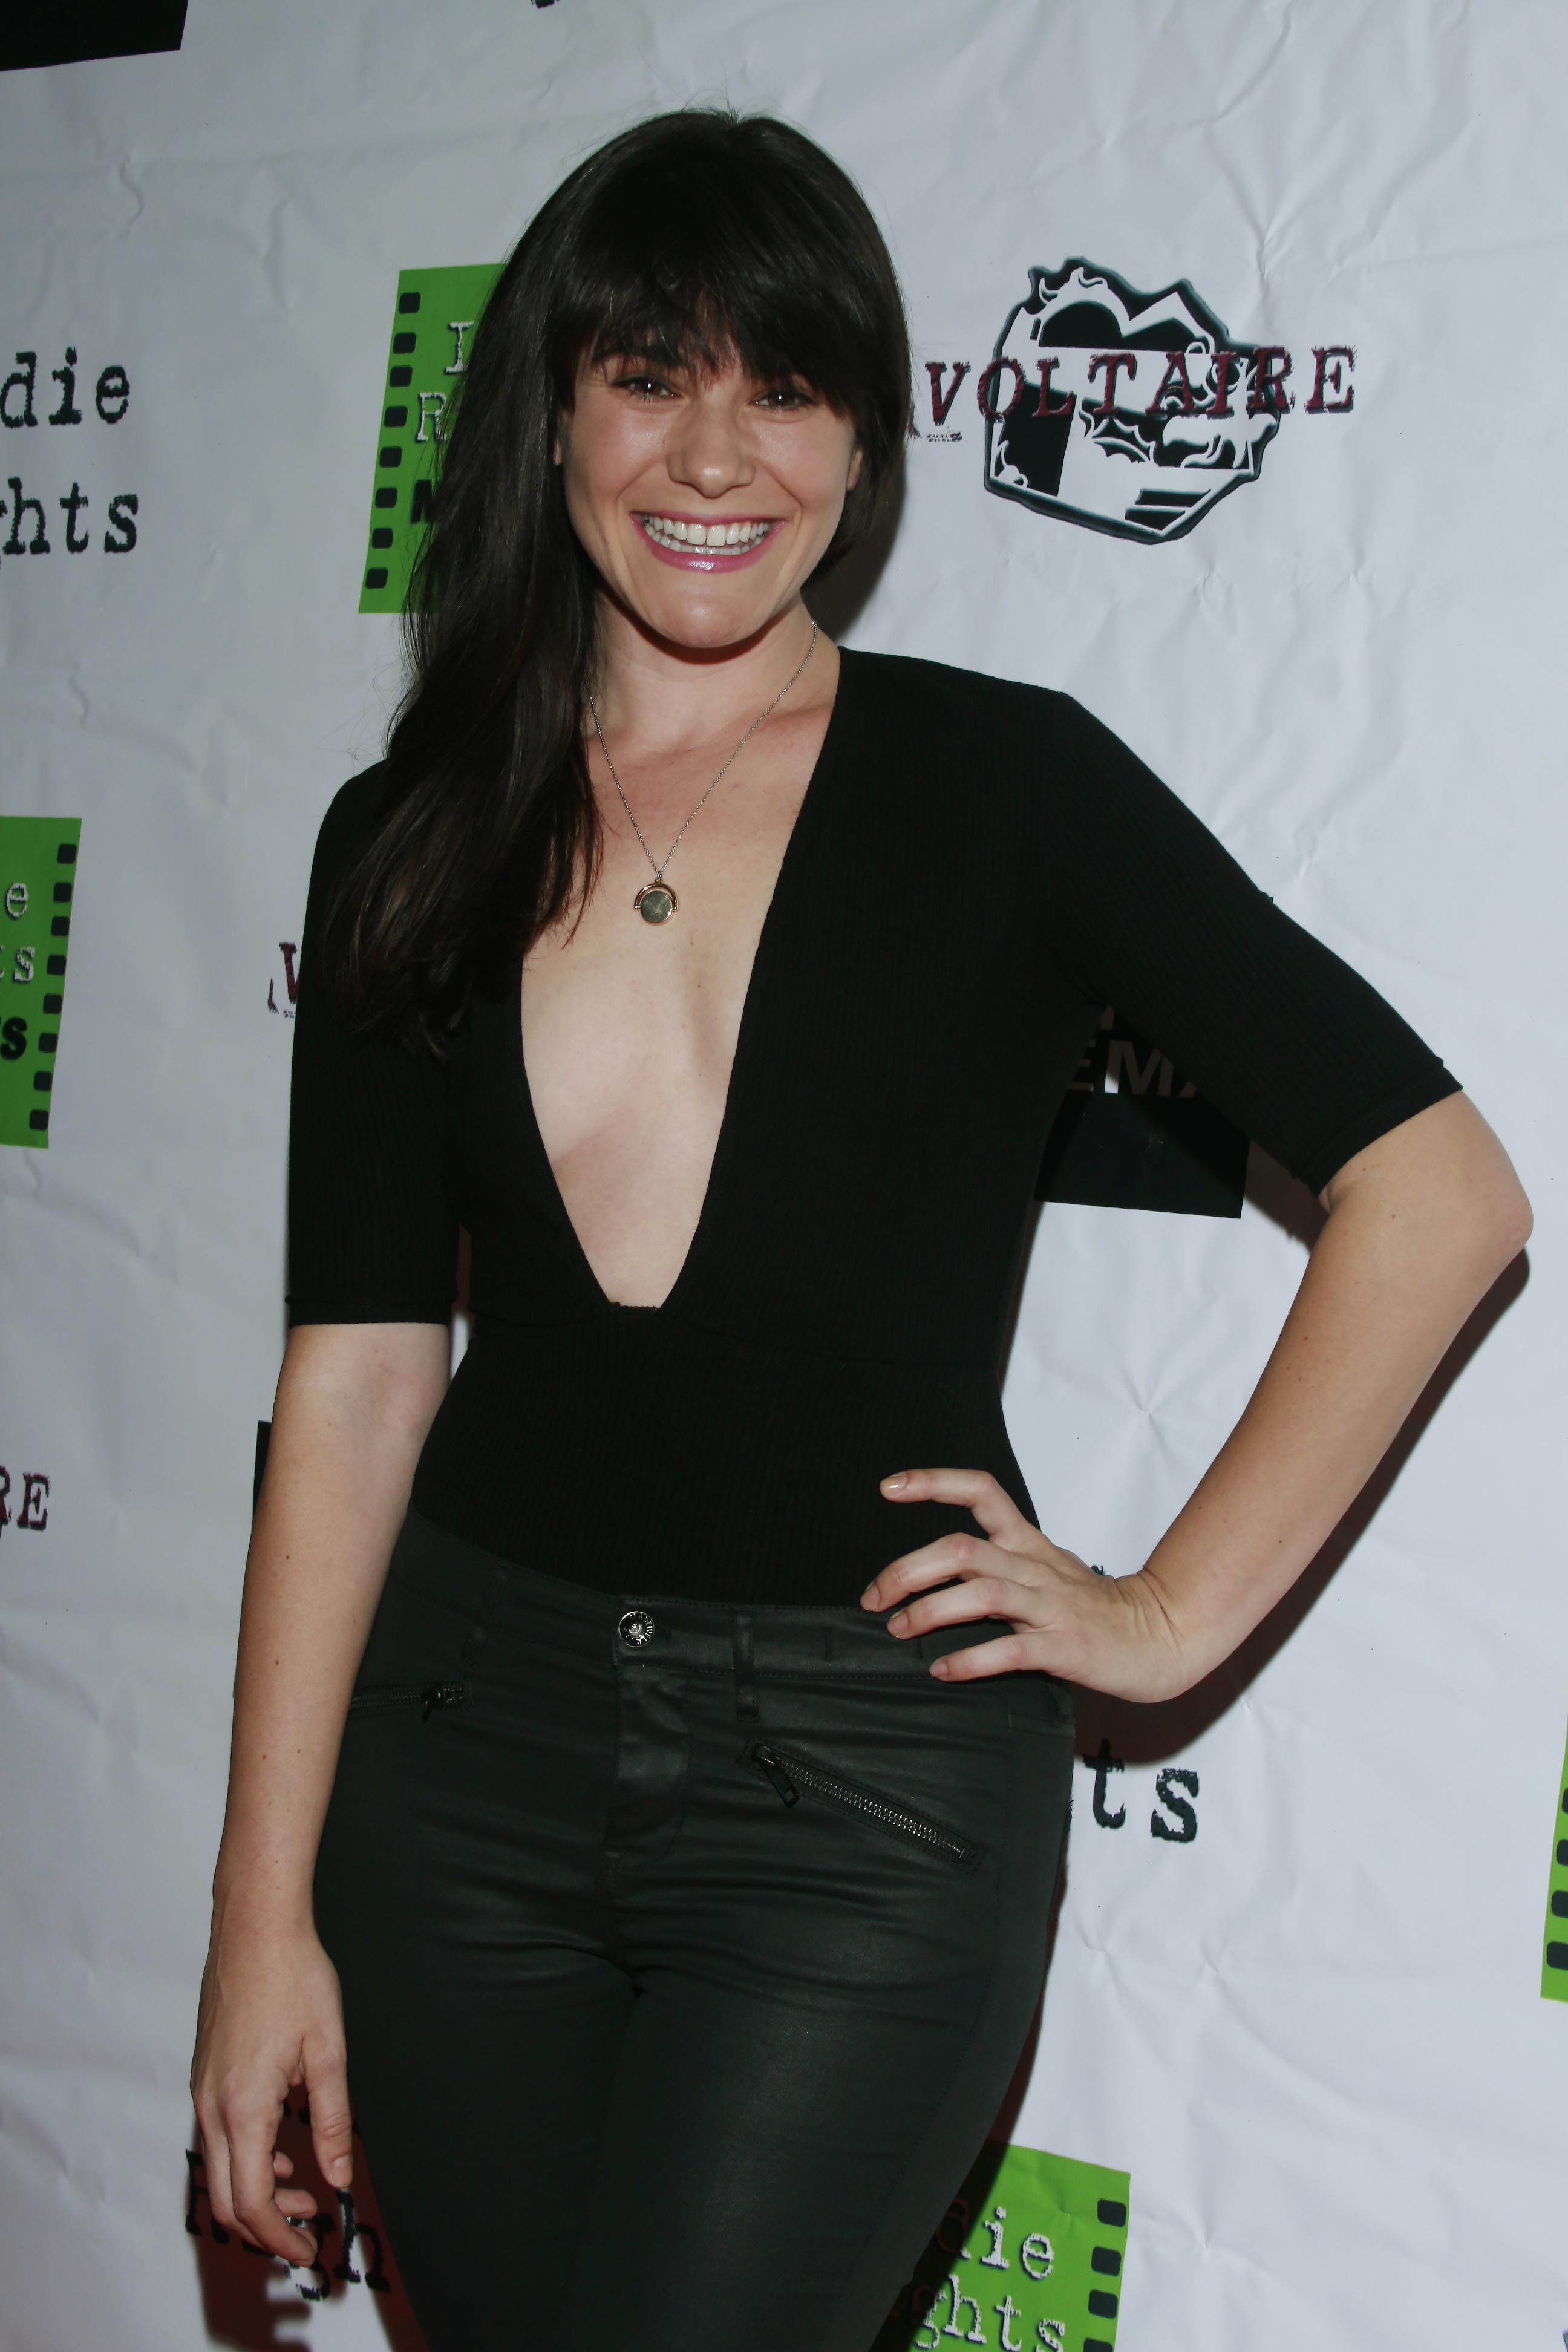 Jillian Leigh